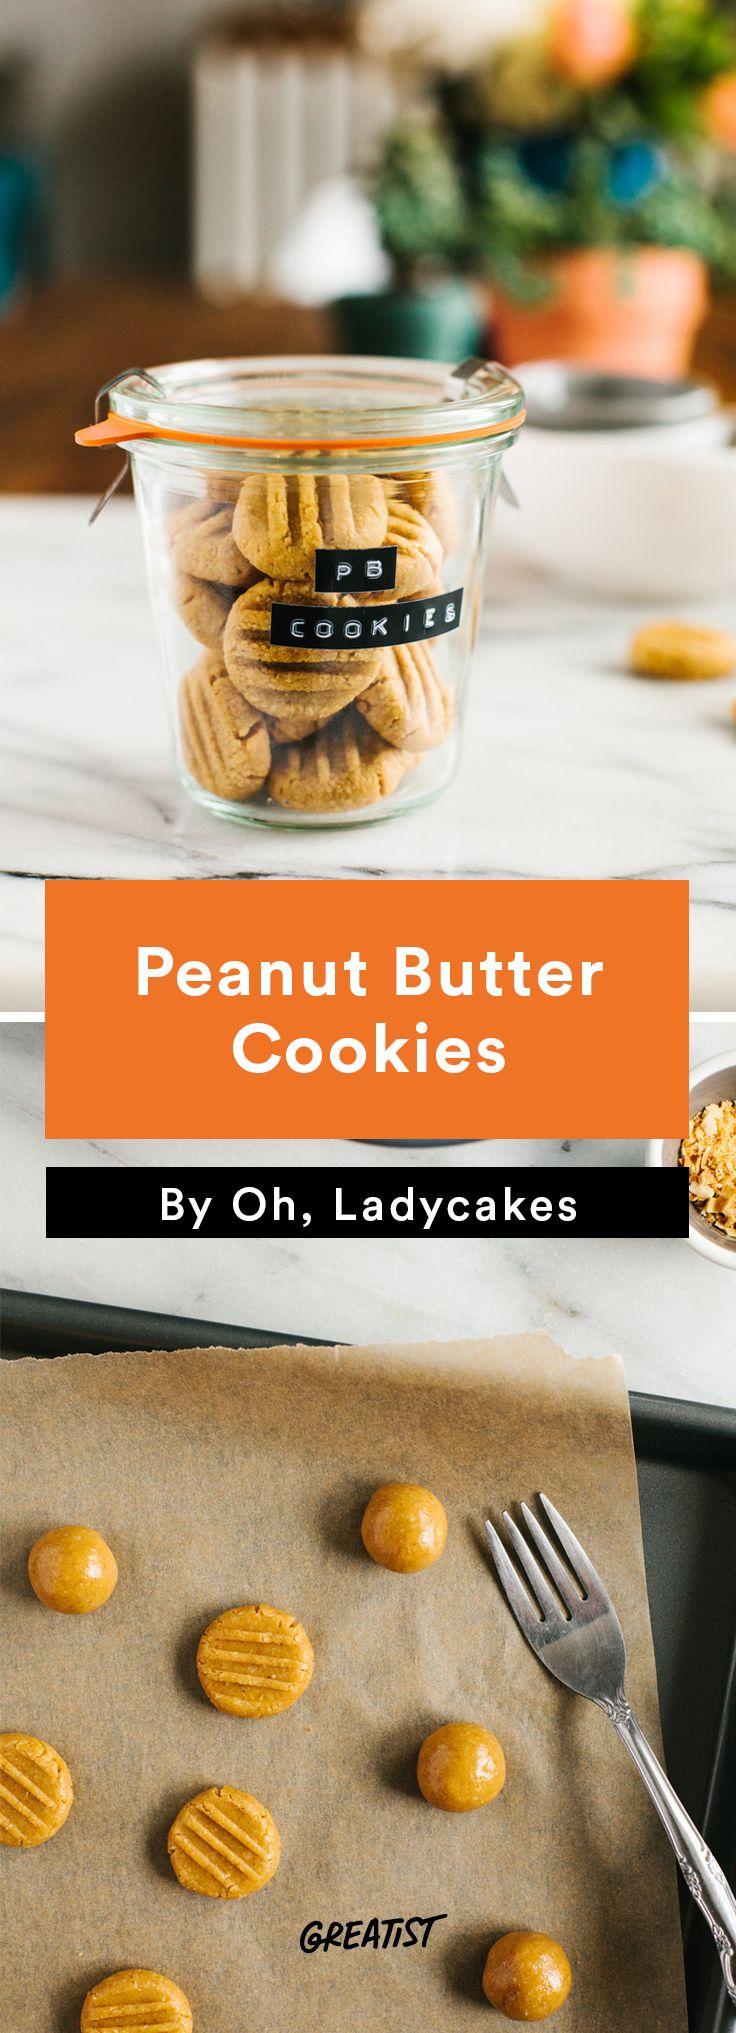 3. Peanut Butter Cookies #Nondairy #dessert #recipes http://greatist.com/eat/non-dairy-dessert-recipes